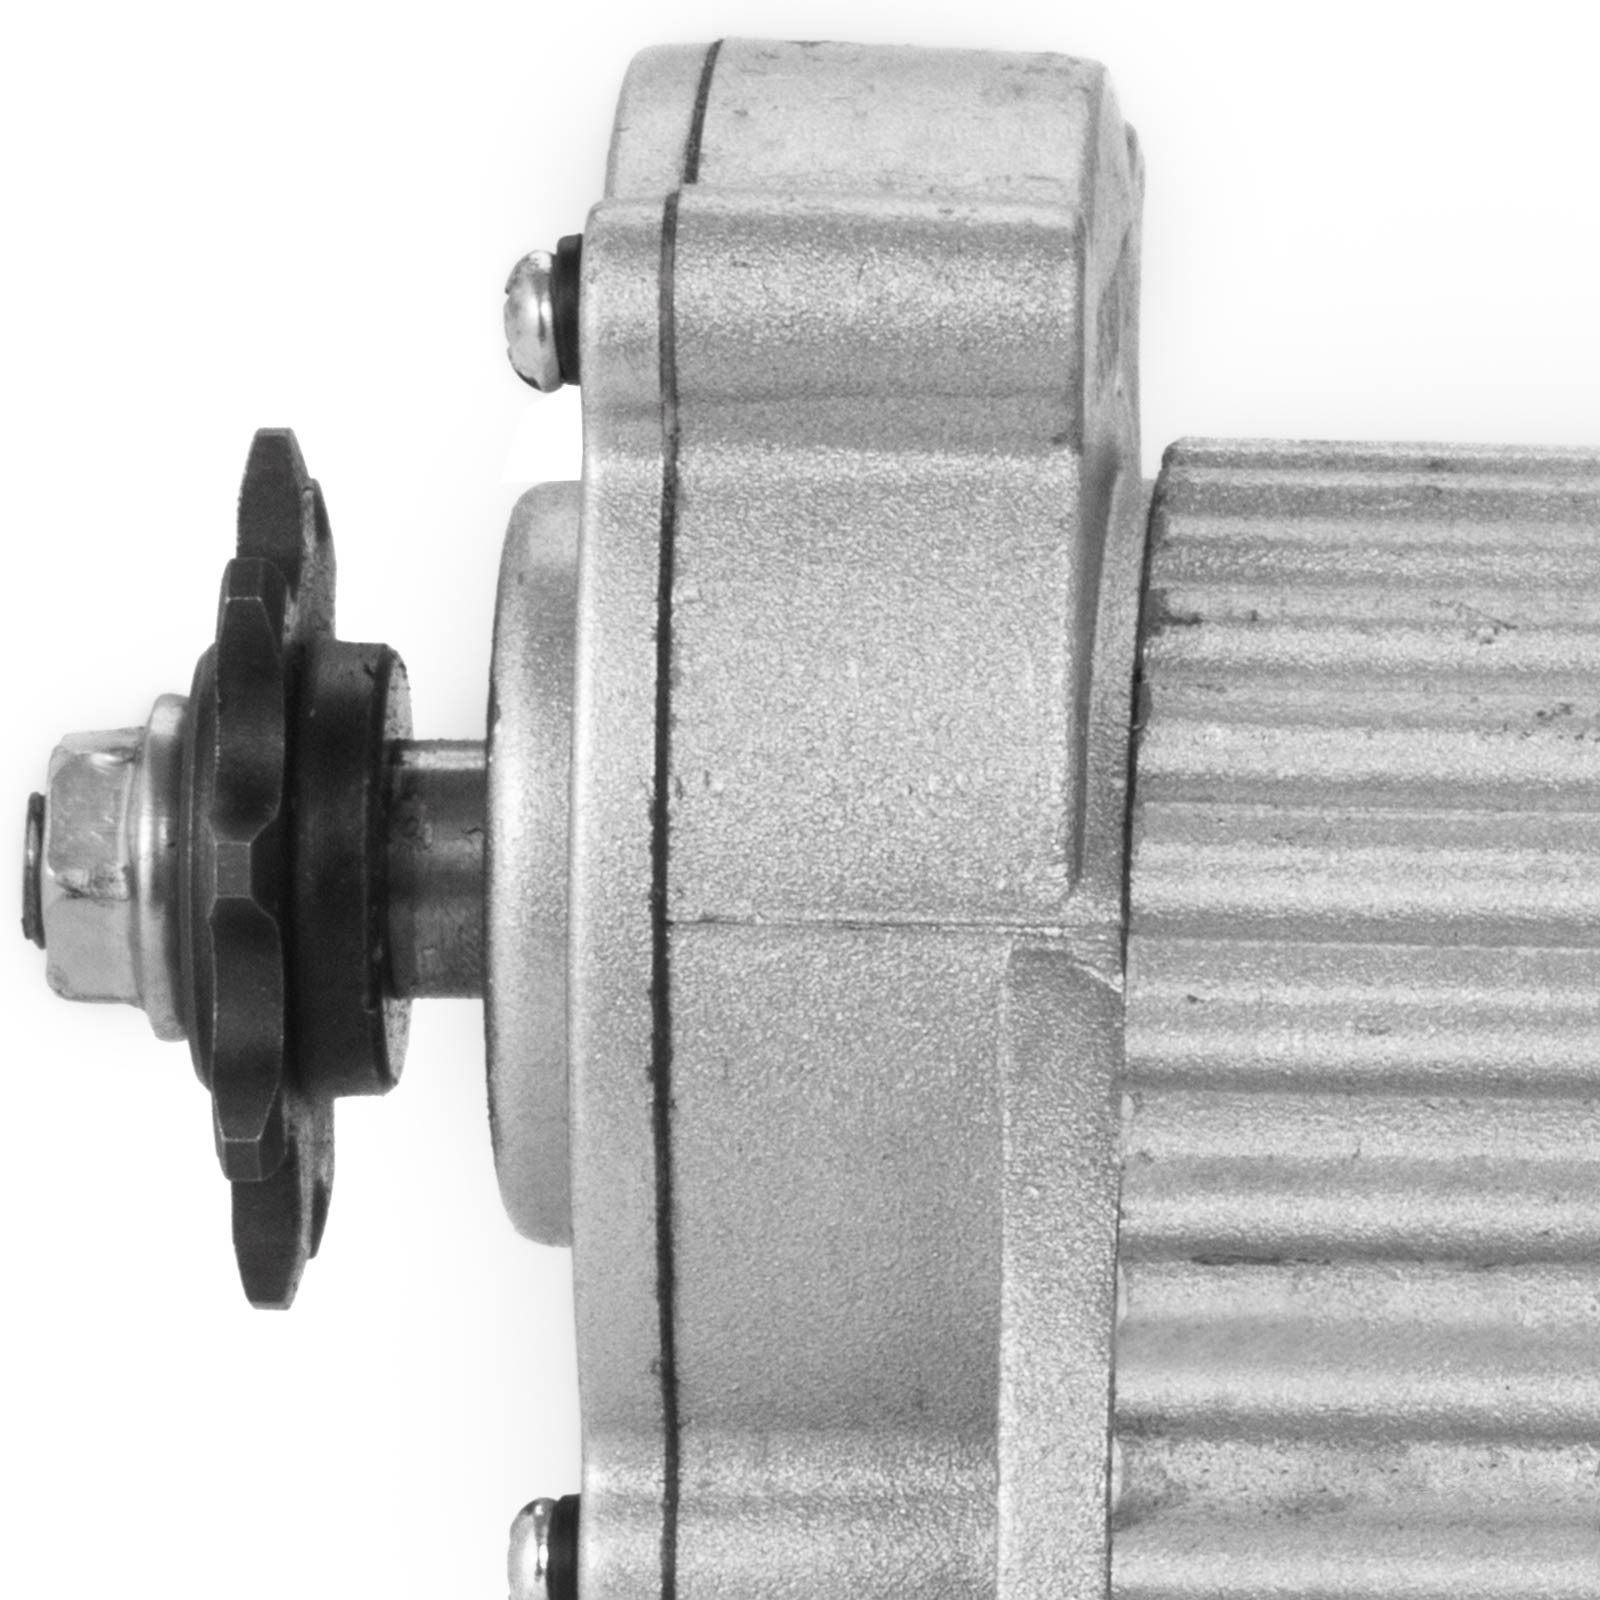 DC-electric-motor-12-60V-150W-2KW-for-scooter-bike-go-kart-minibike-e-ATV thumbnail 68